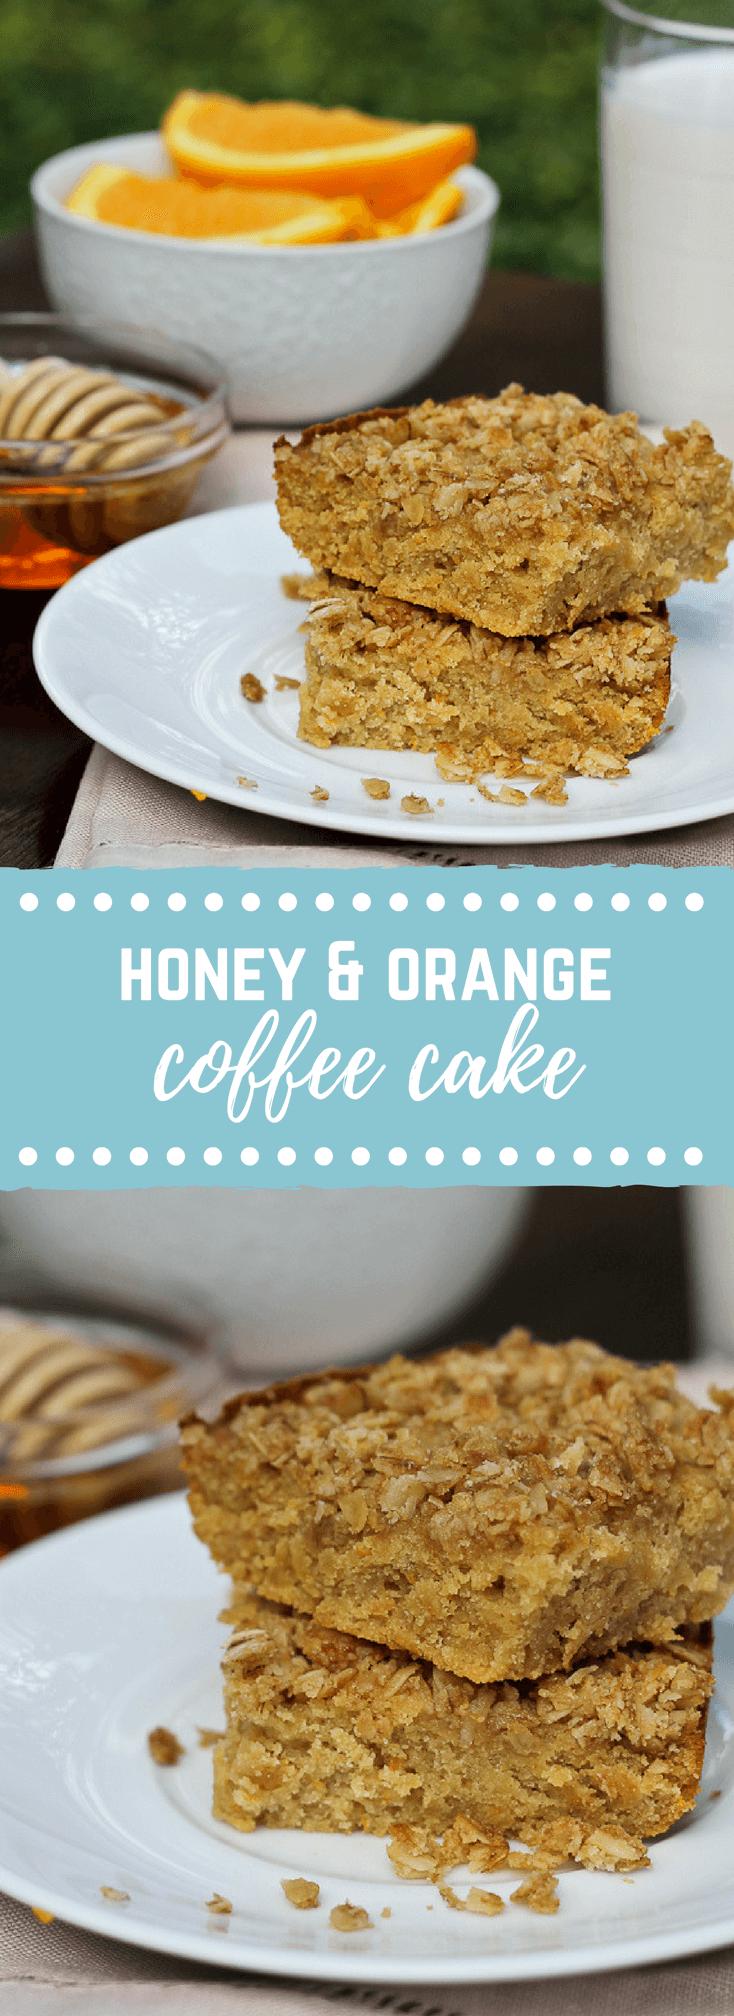 This Honey Orange Gluten Free Coffee Cake rivals any coffee shop coffee cake! Happy baking, honey.